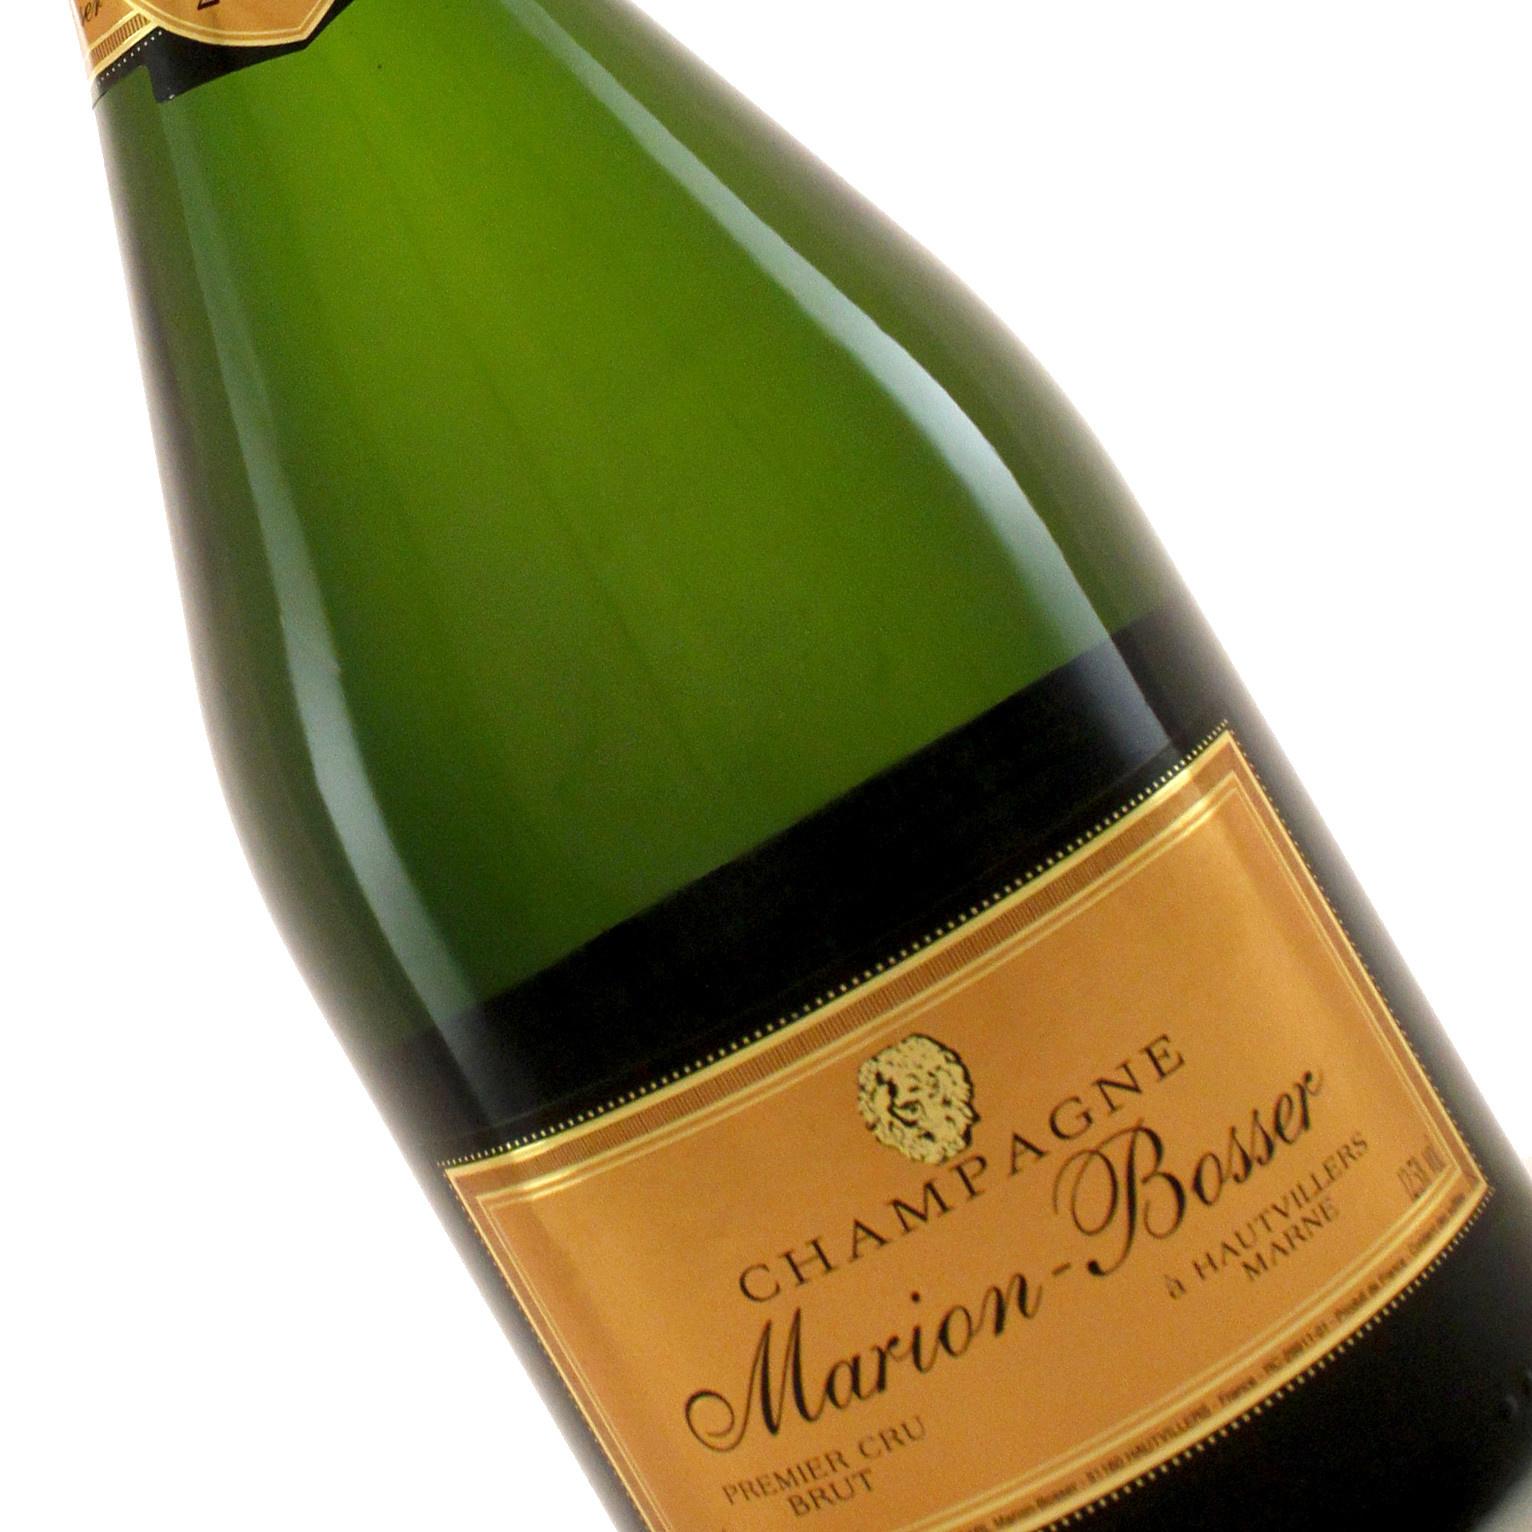 Marion-Bosser 2012 Champagne Premier Cru Brut, Hautvillers